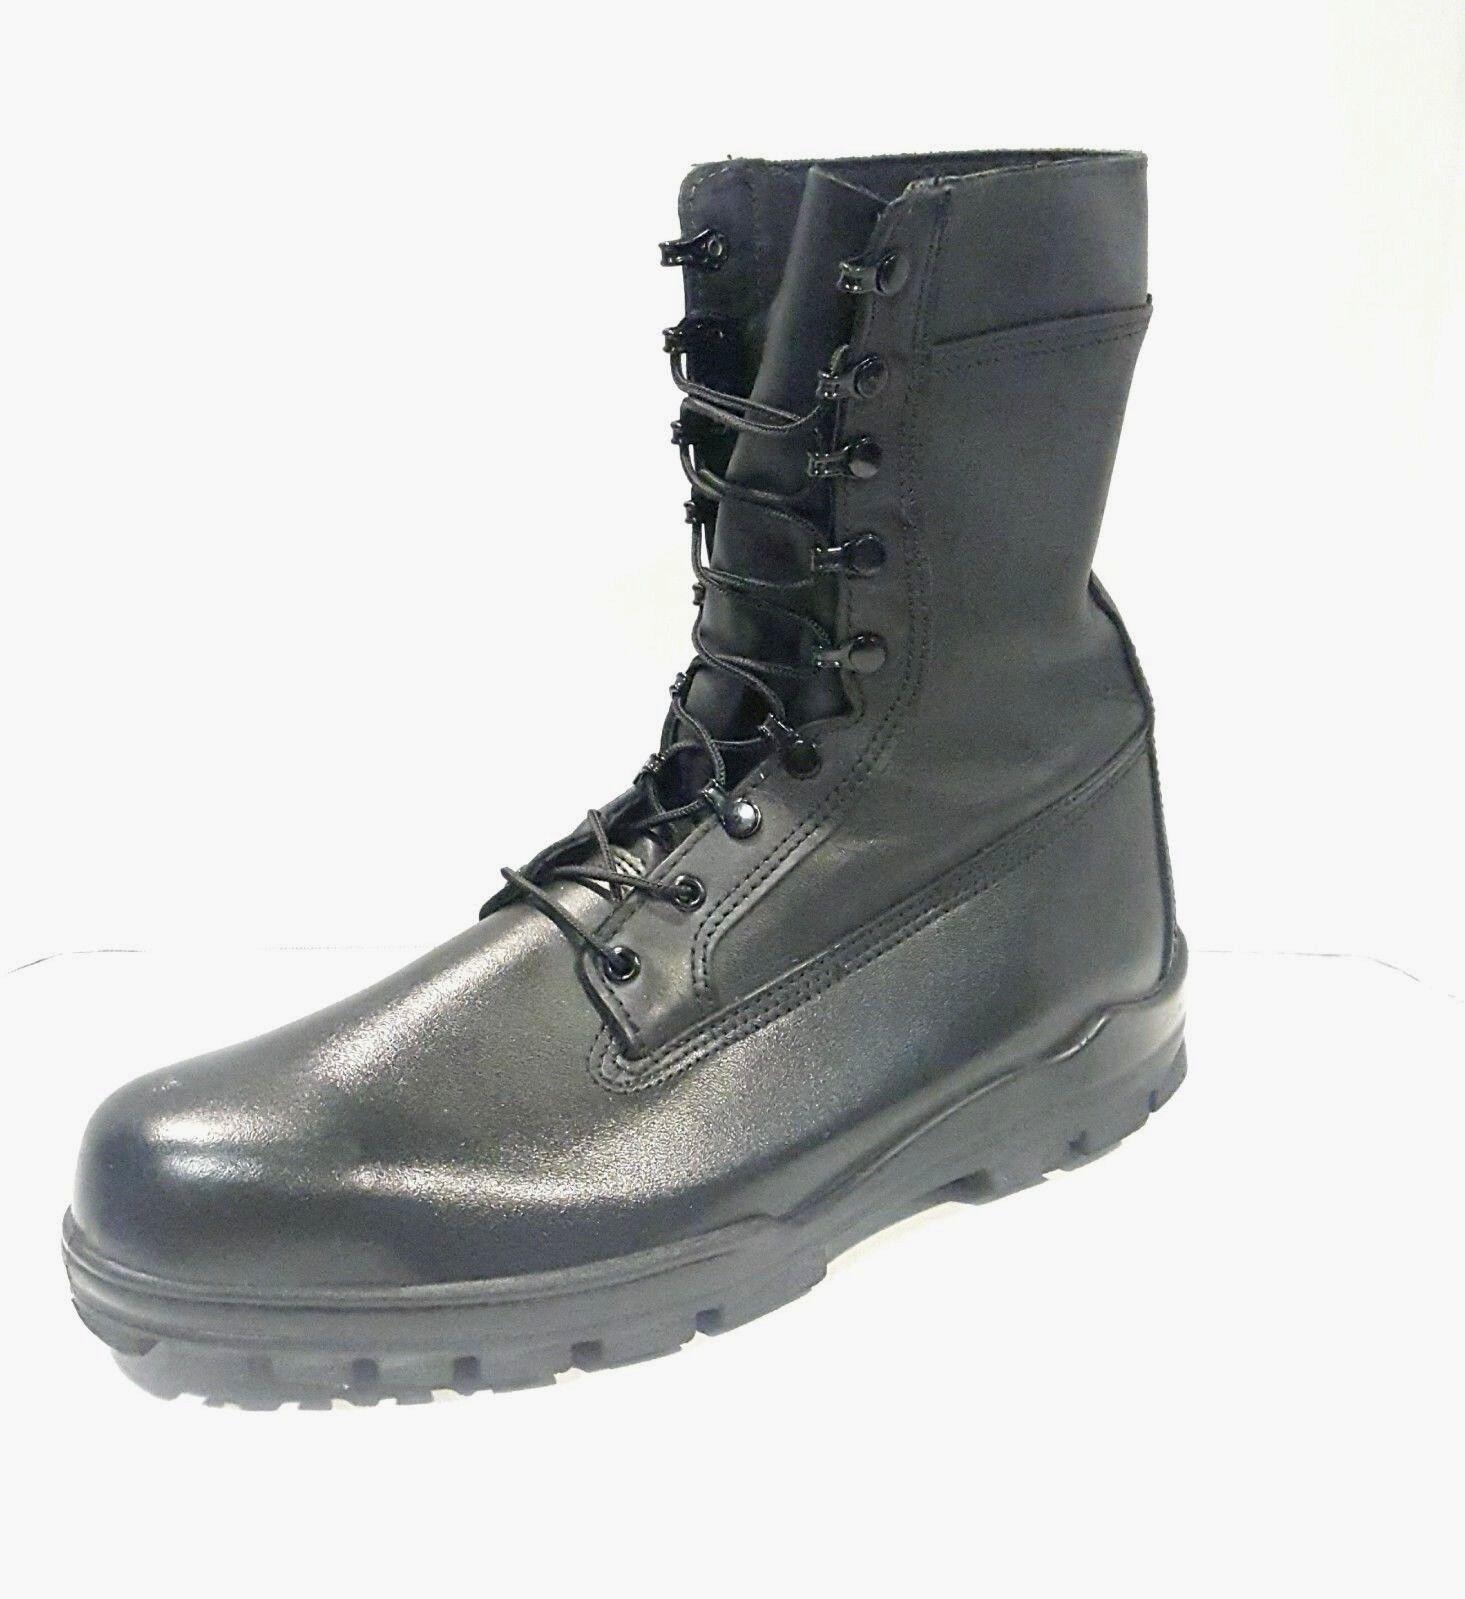 Bates US Navy Durashock Steel Toe Military Boot 15B30-002034-101(Size:15 XW)